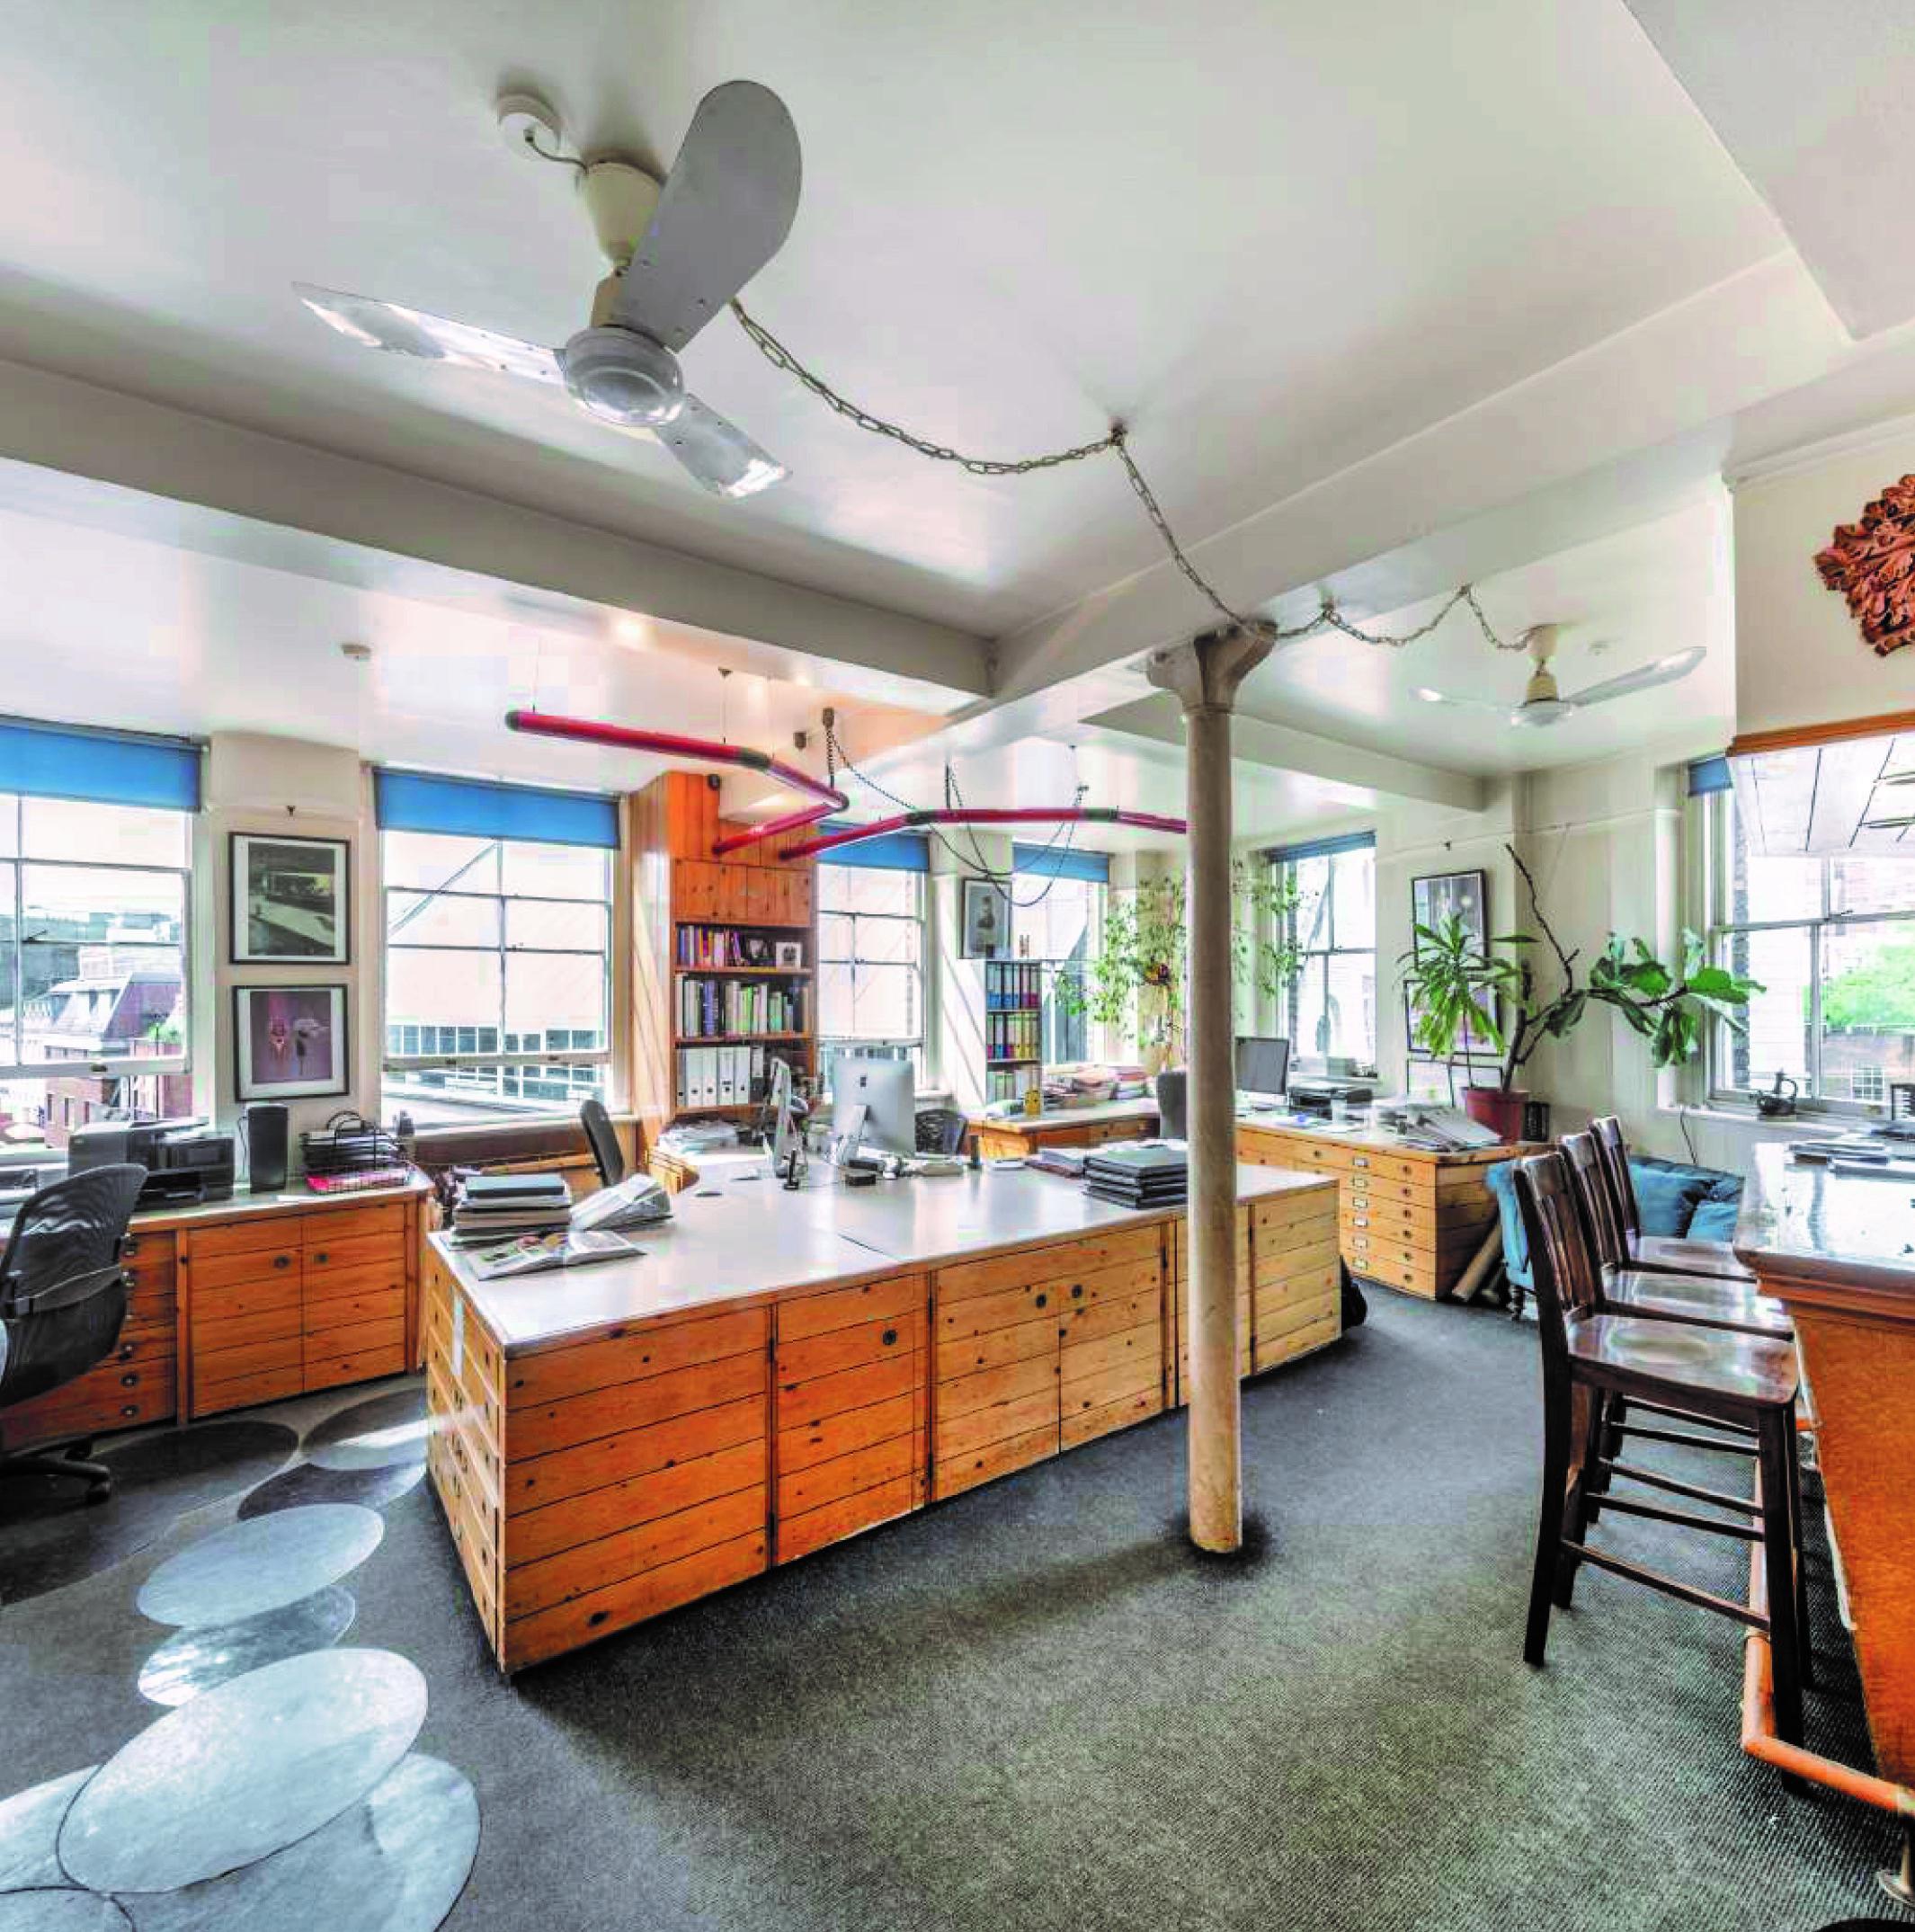 The Folio studio office